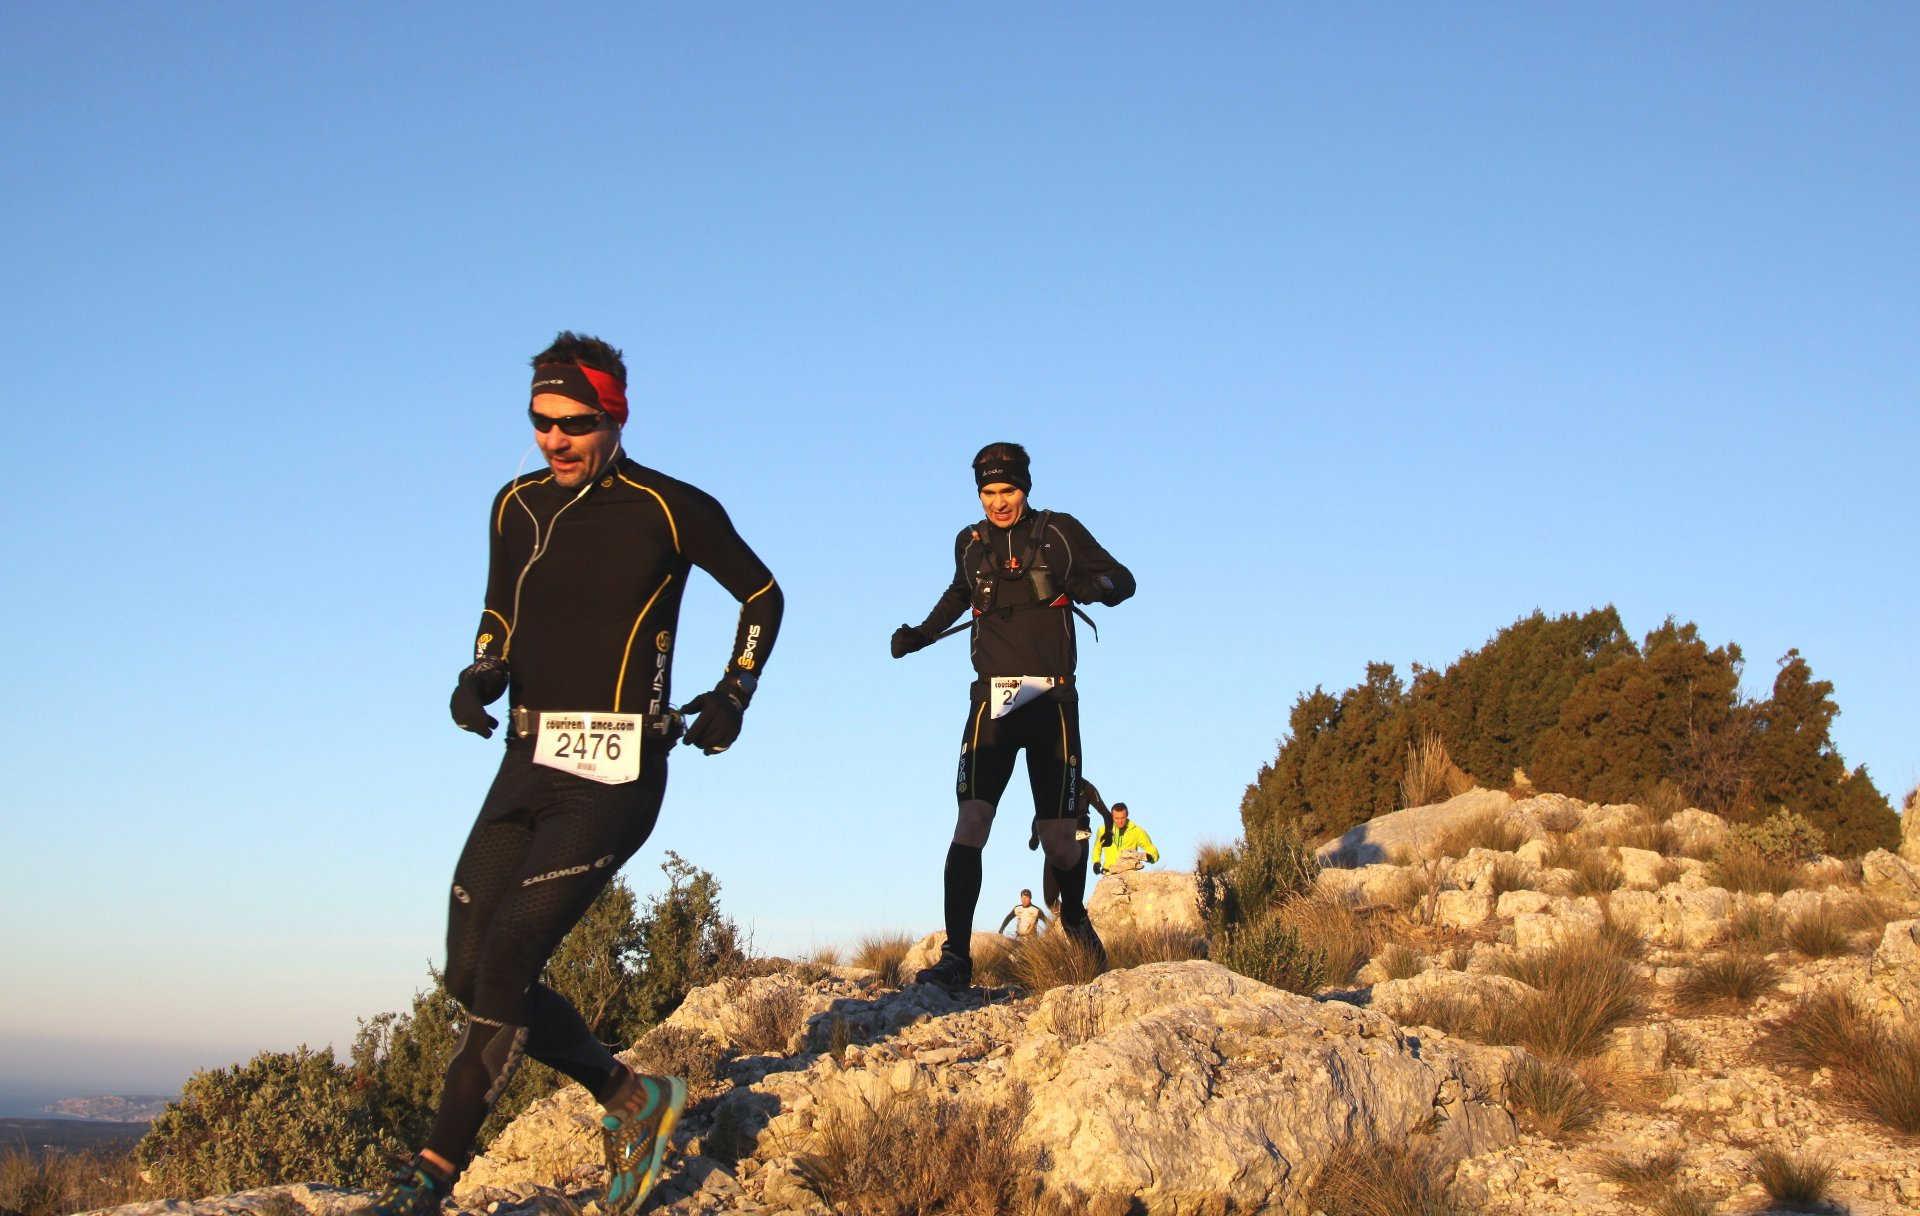 Calendrier Trail Finistere.Trail De Guerlesquin 2020 Guerlesquin Finistere France